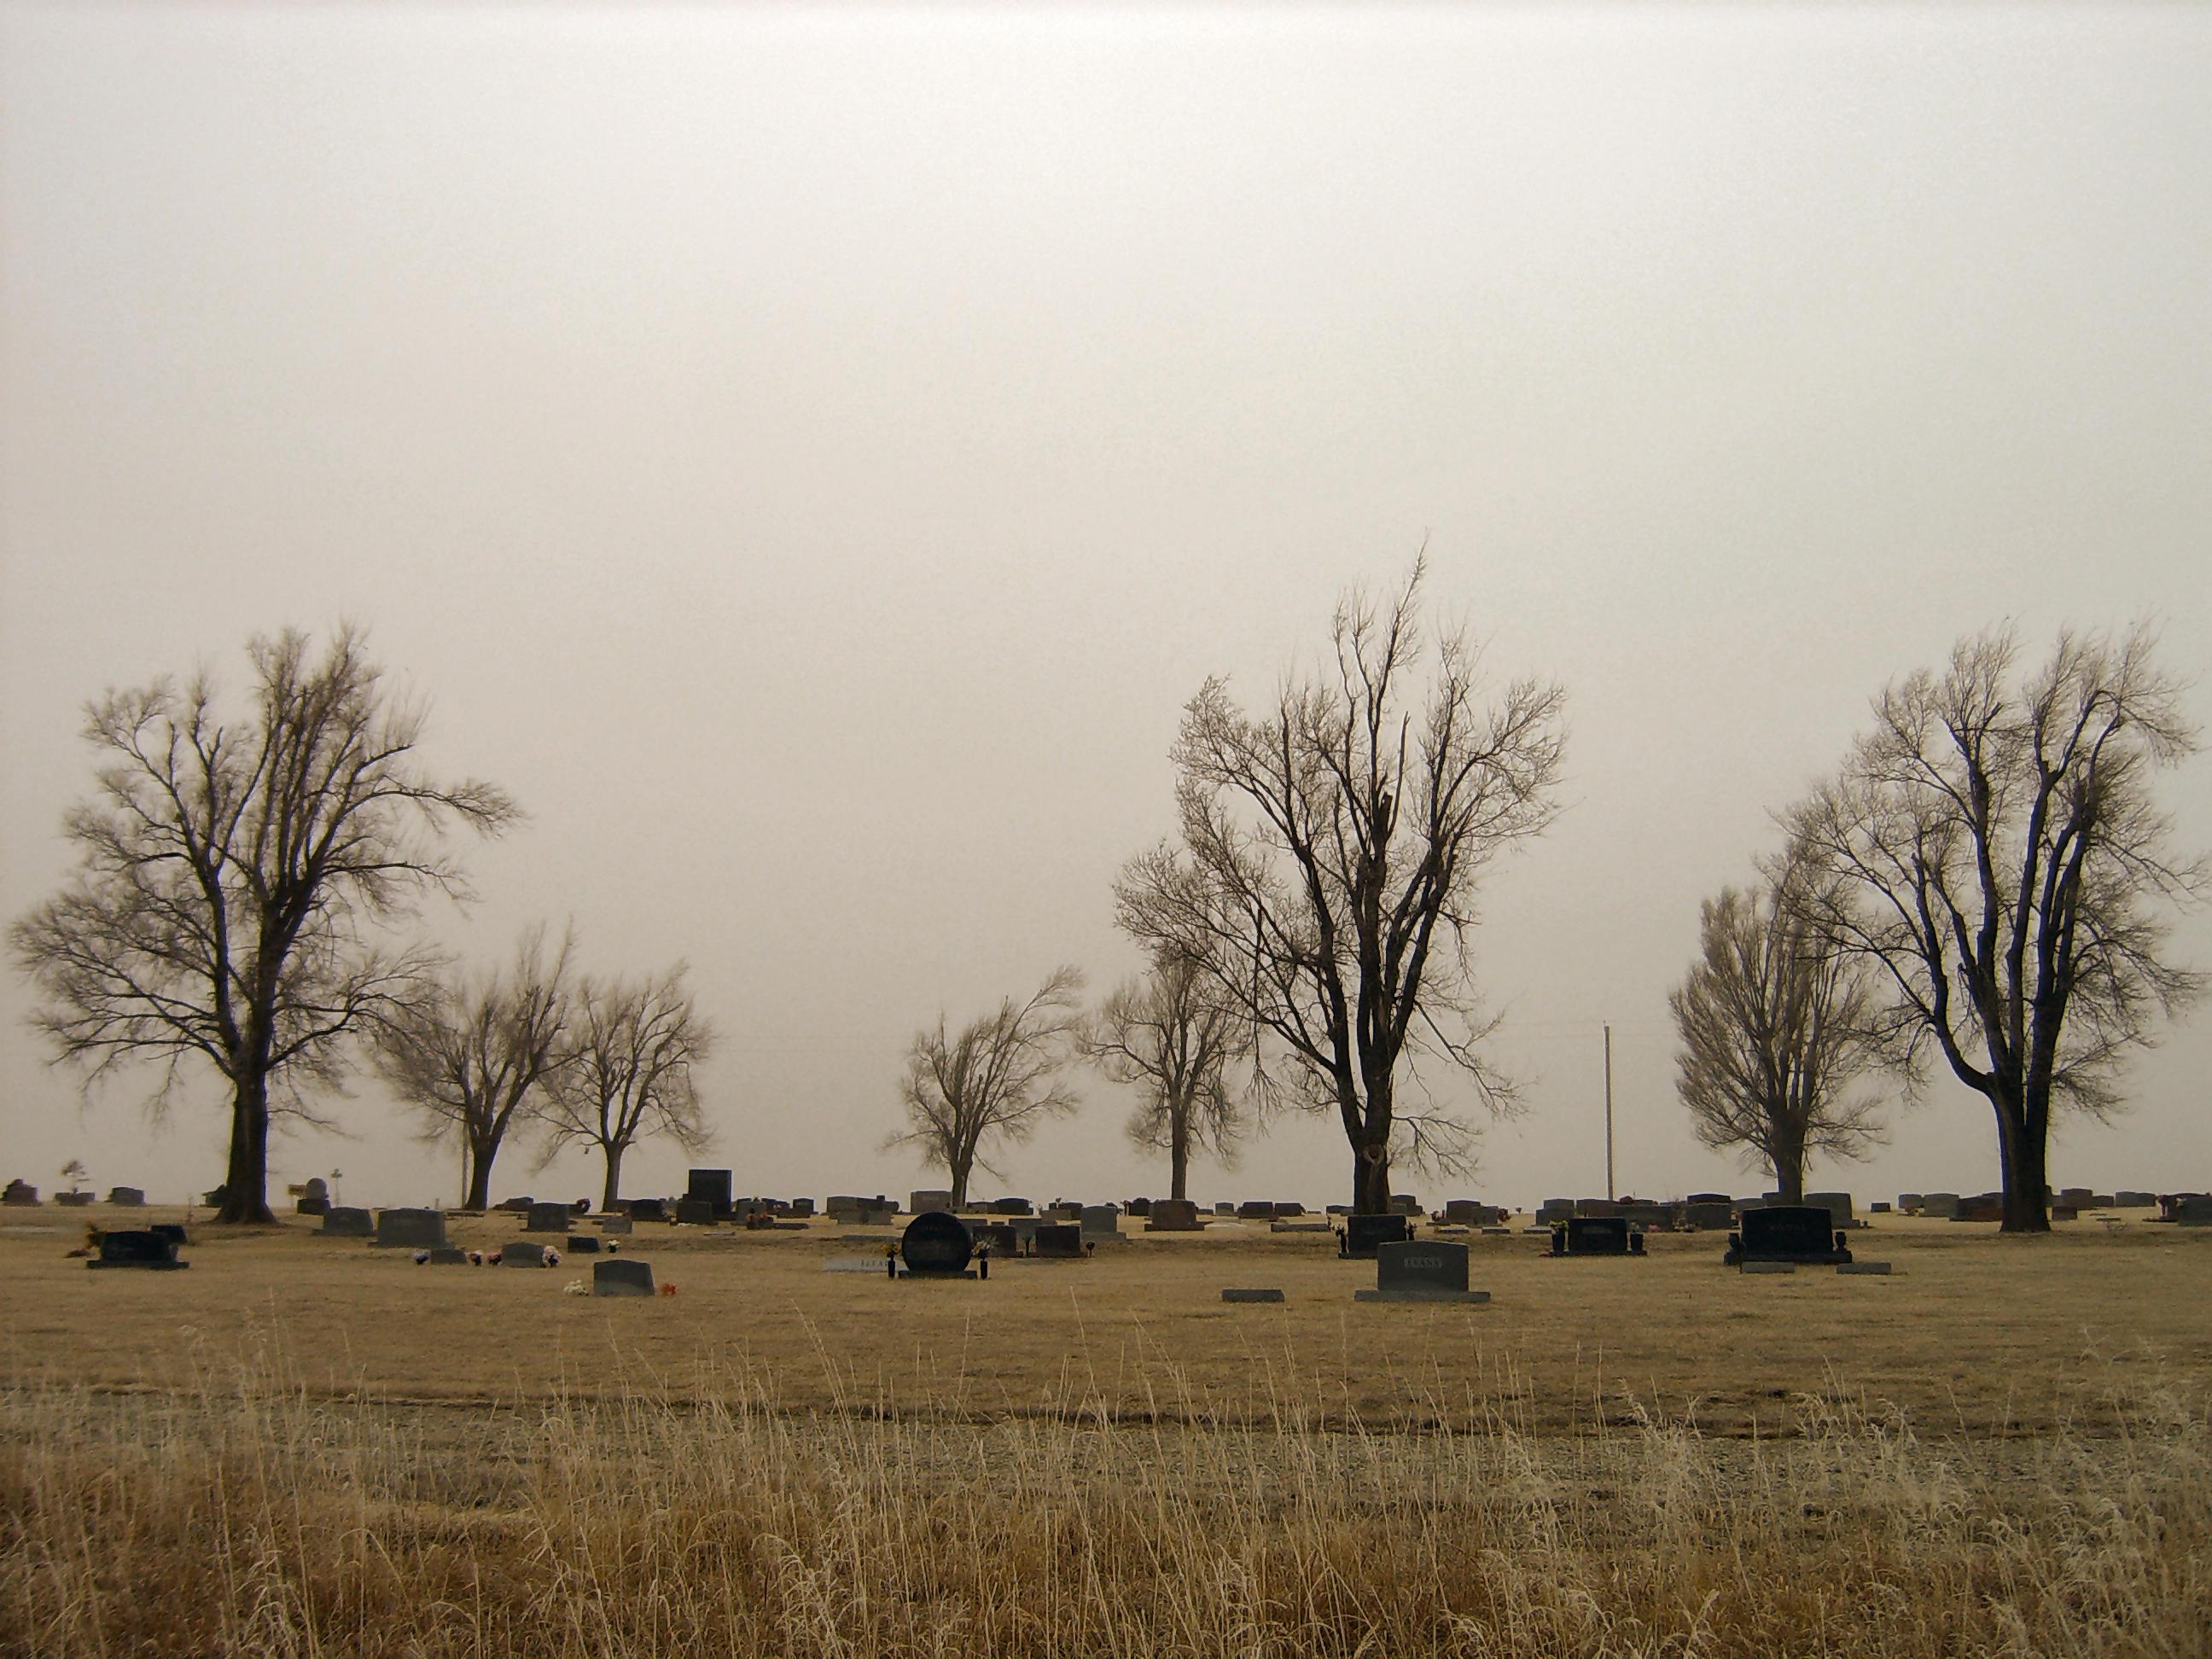 Trees n Graves 2 by DarkMaiden-Stock on deviantART